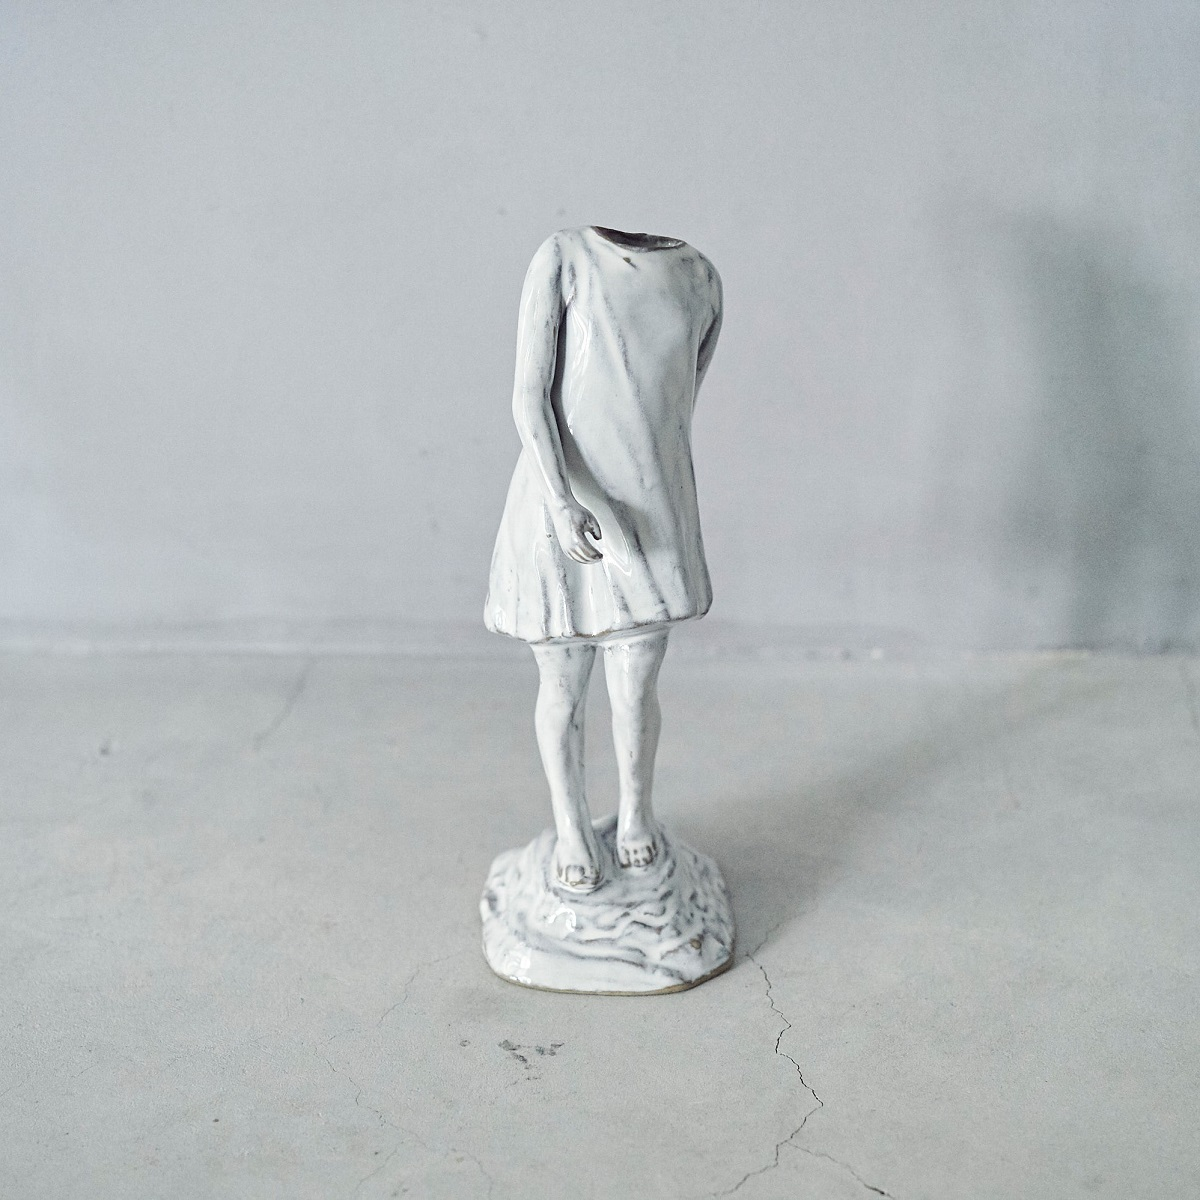 Yarnnakarn 一輪挿し 「Still Life Girl Vase」